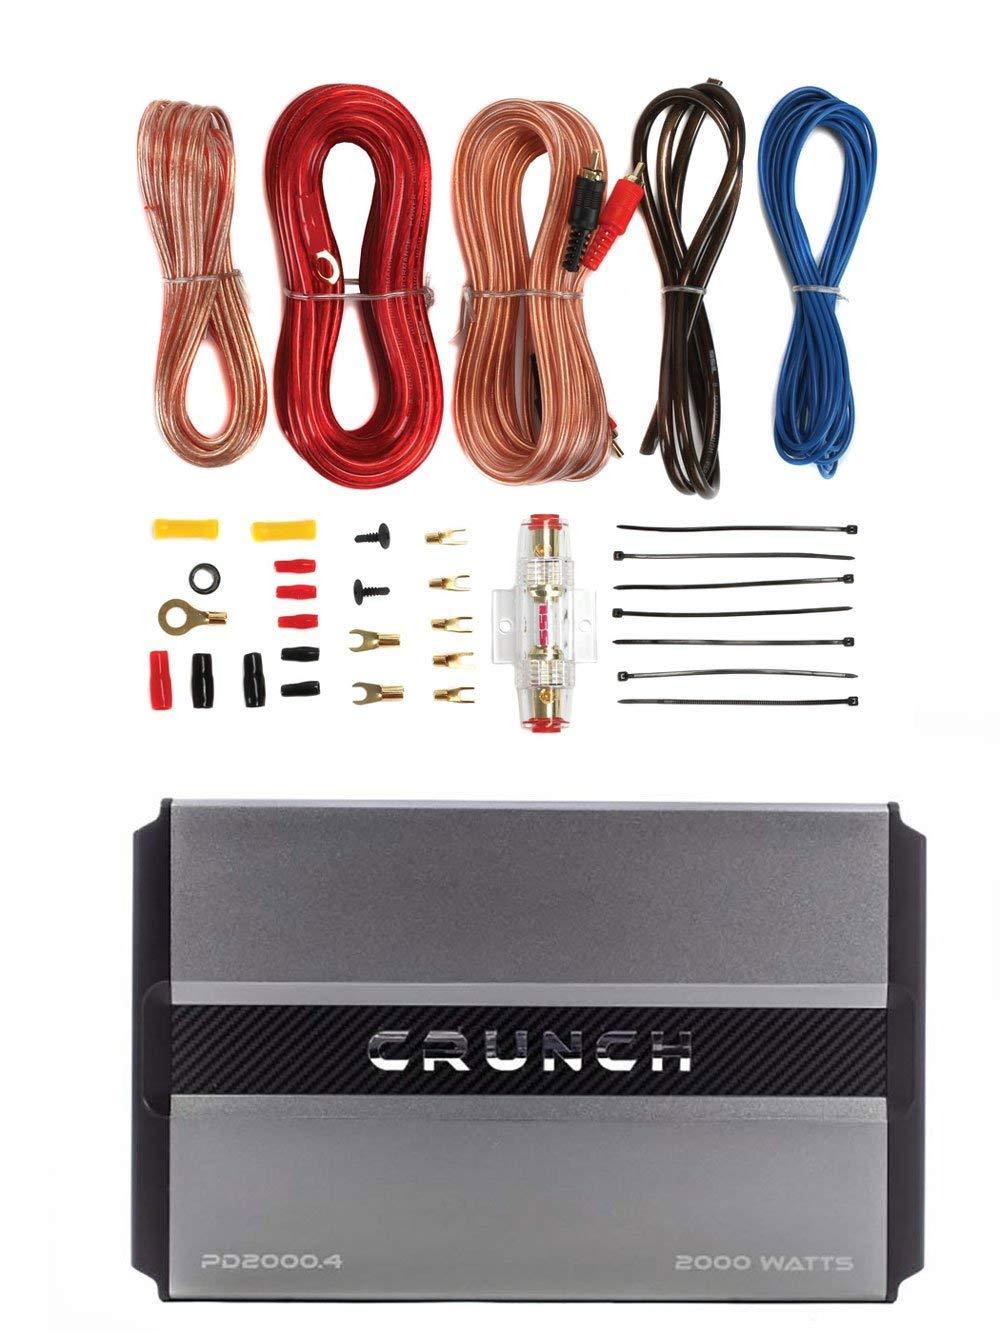 medium resolution of cheap high power 4 channel amp find high power 4 channel amp deals crunch a four channel amp wiring on power acoustik amp wiring kit